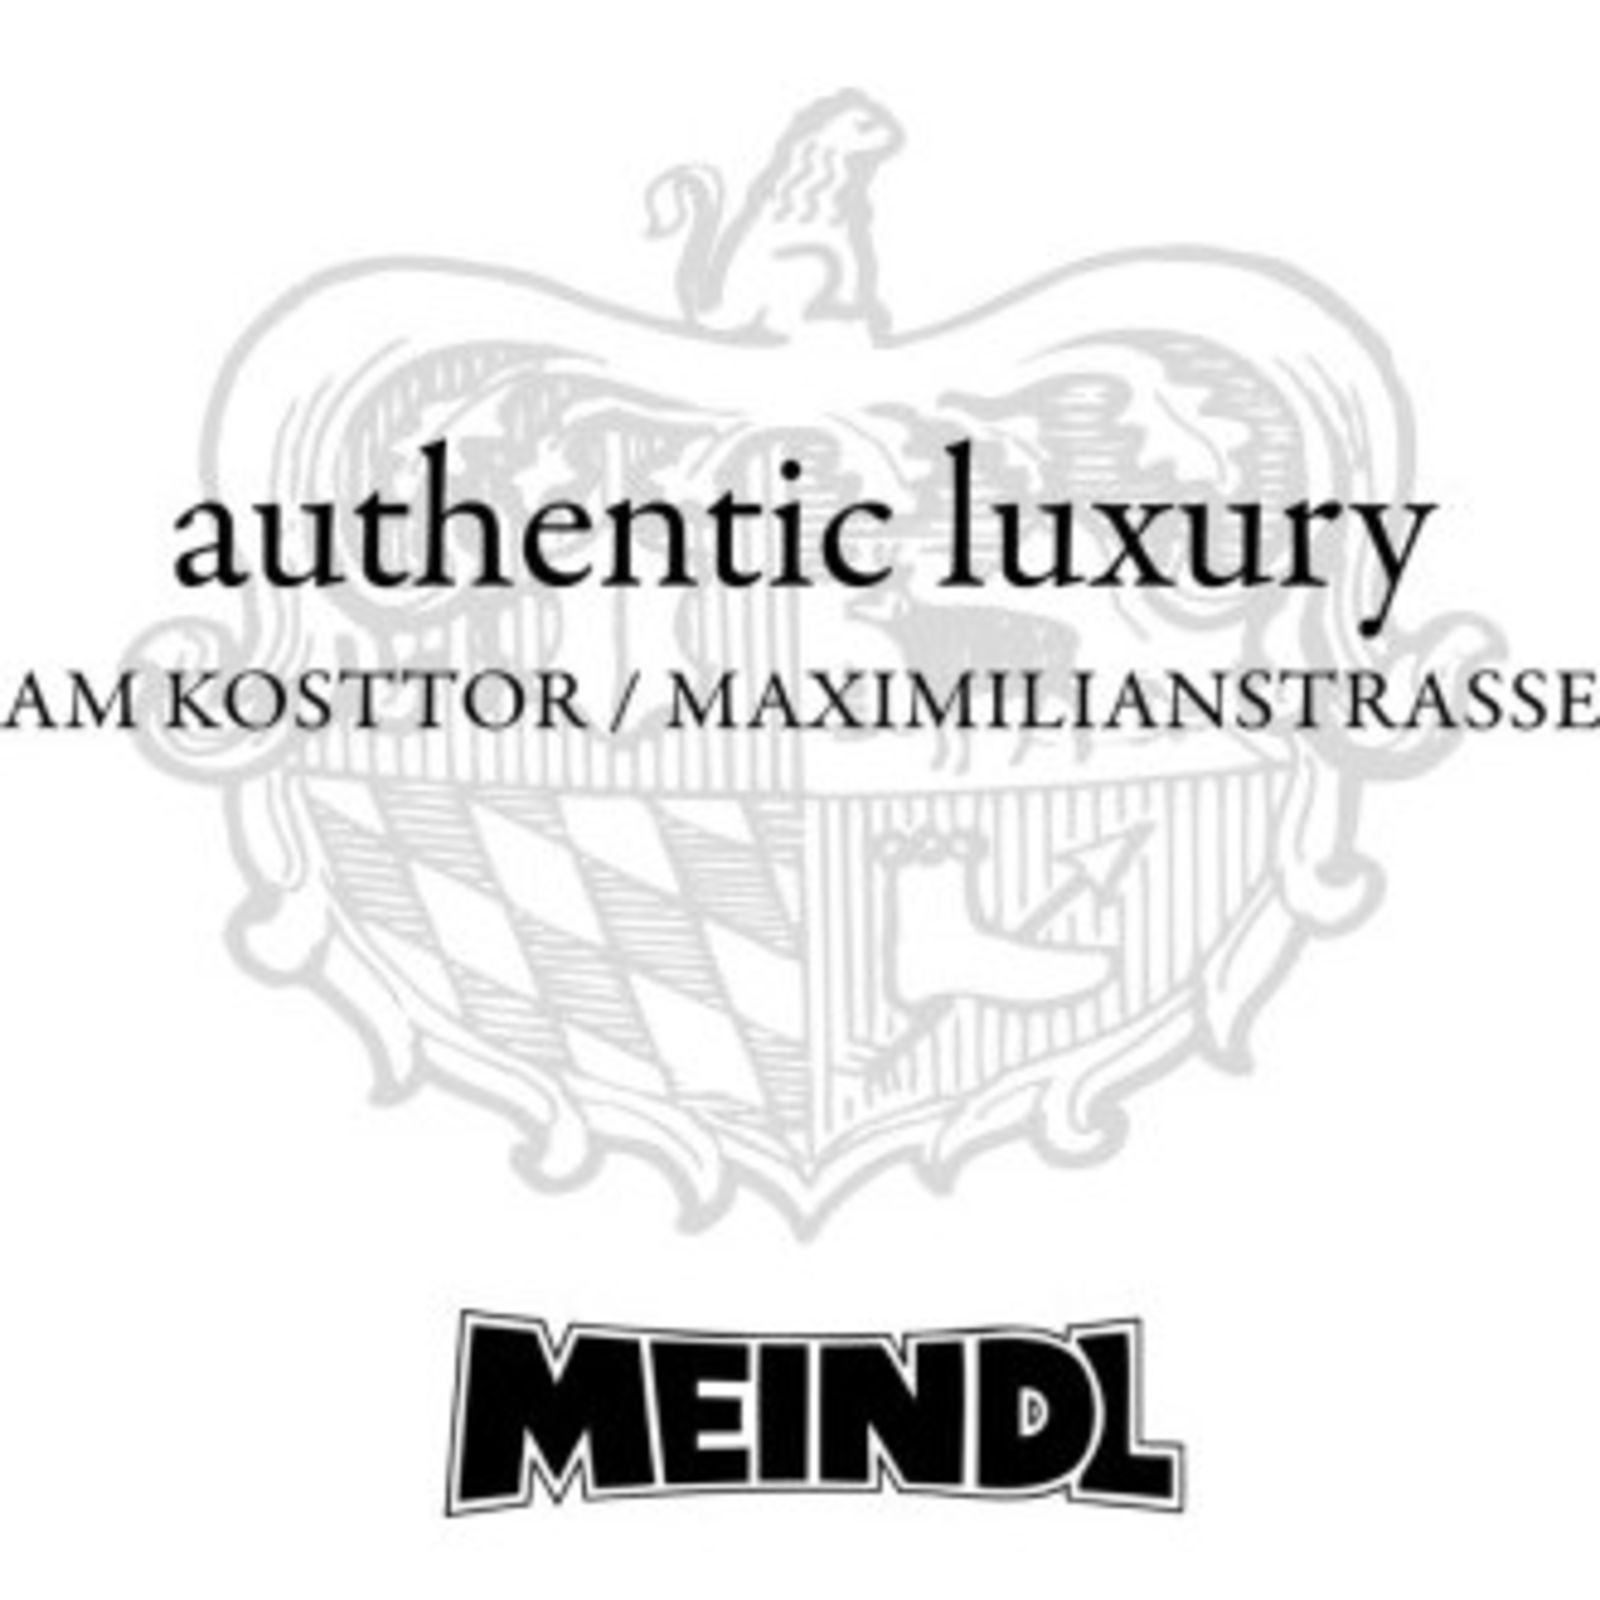 MEINDL authentic luxury